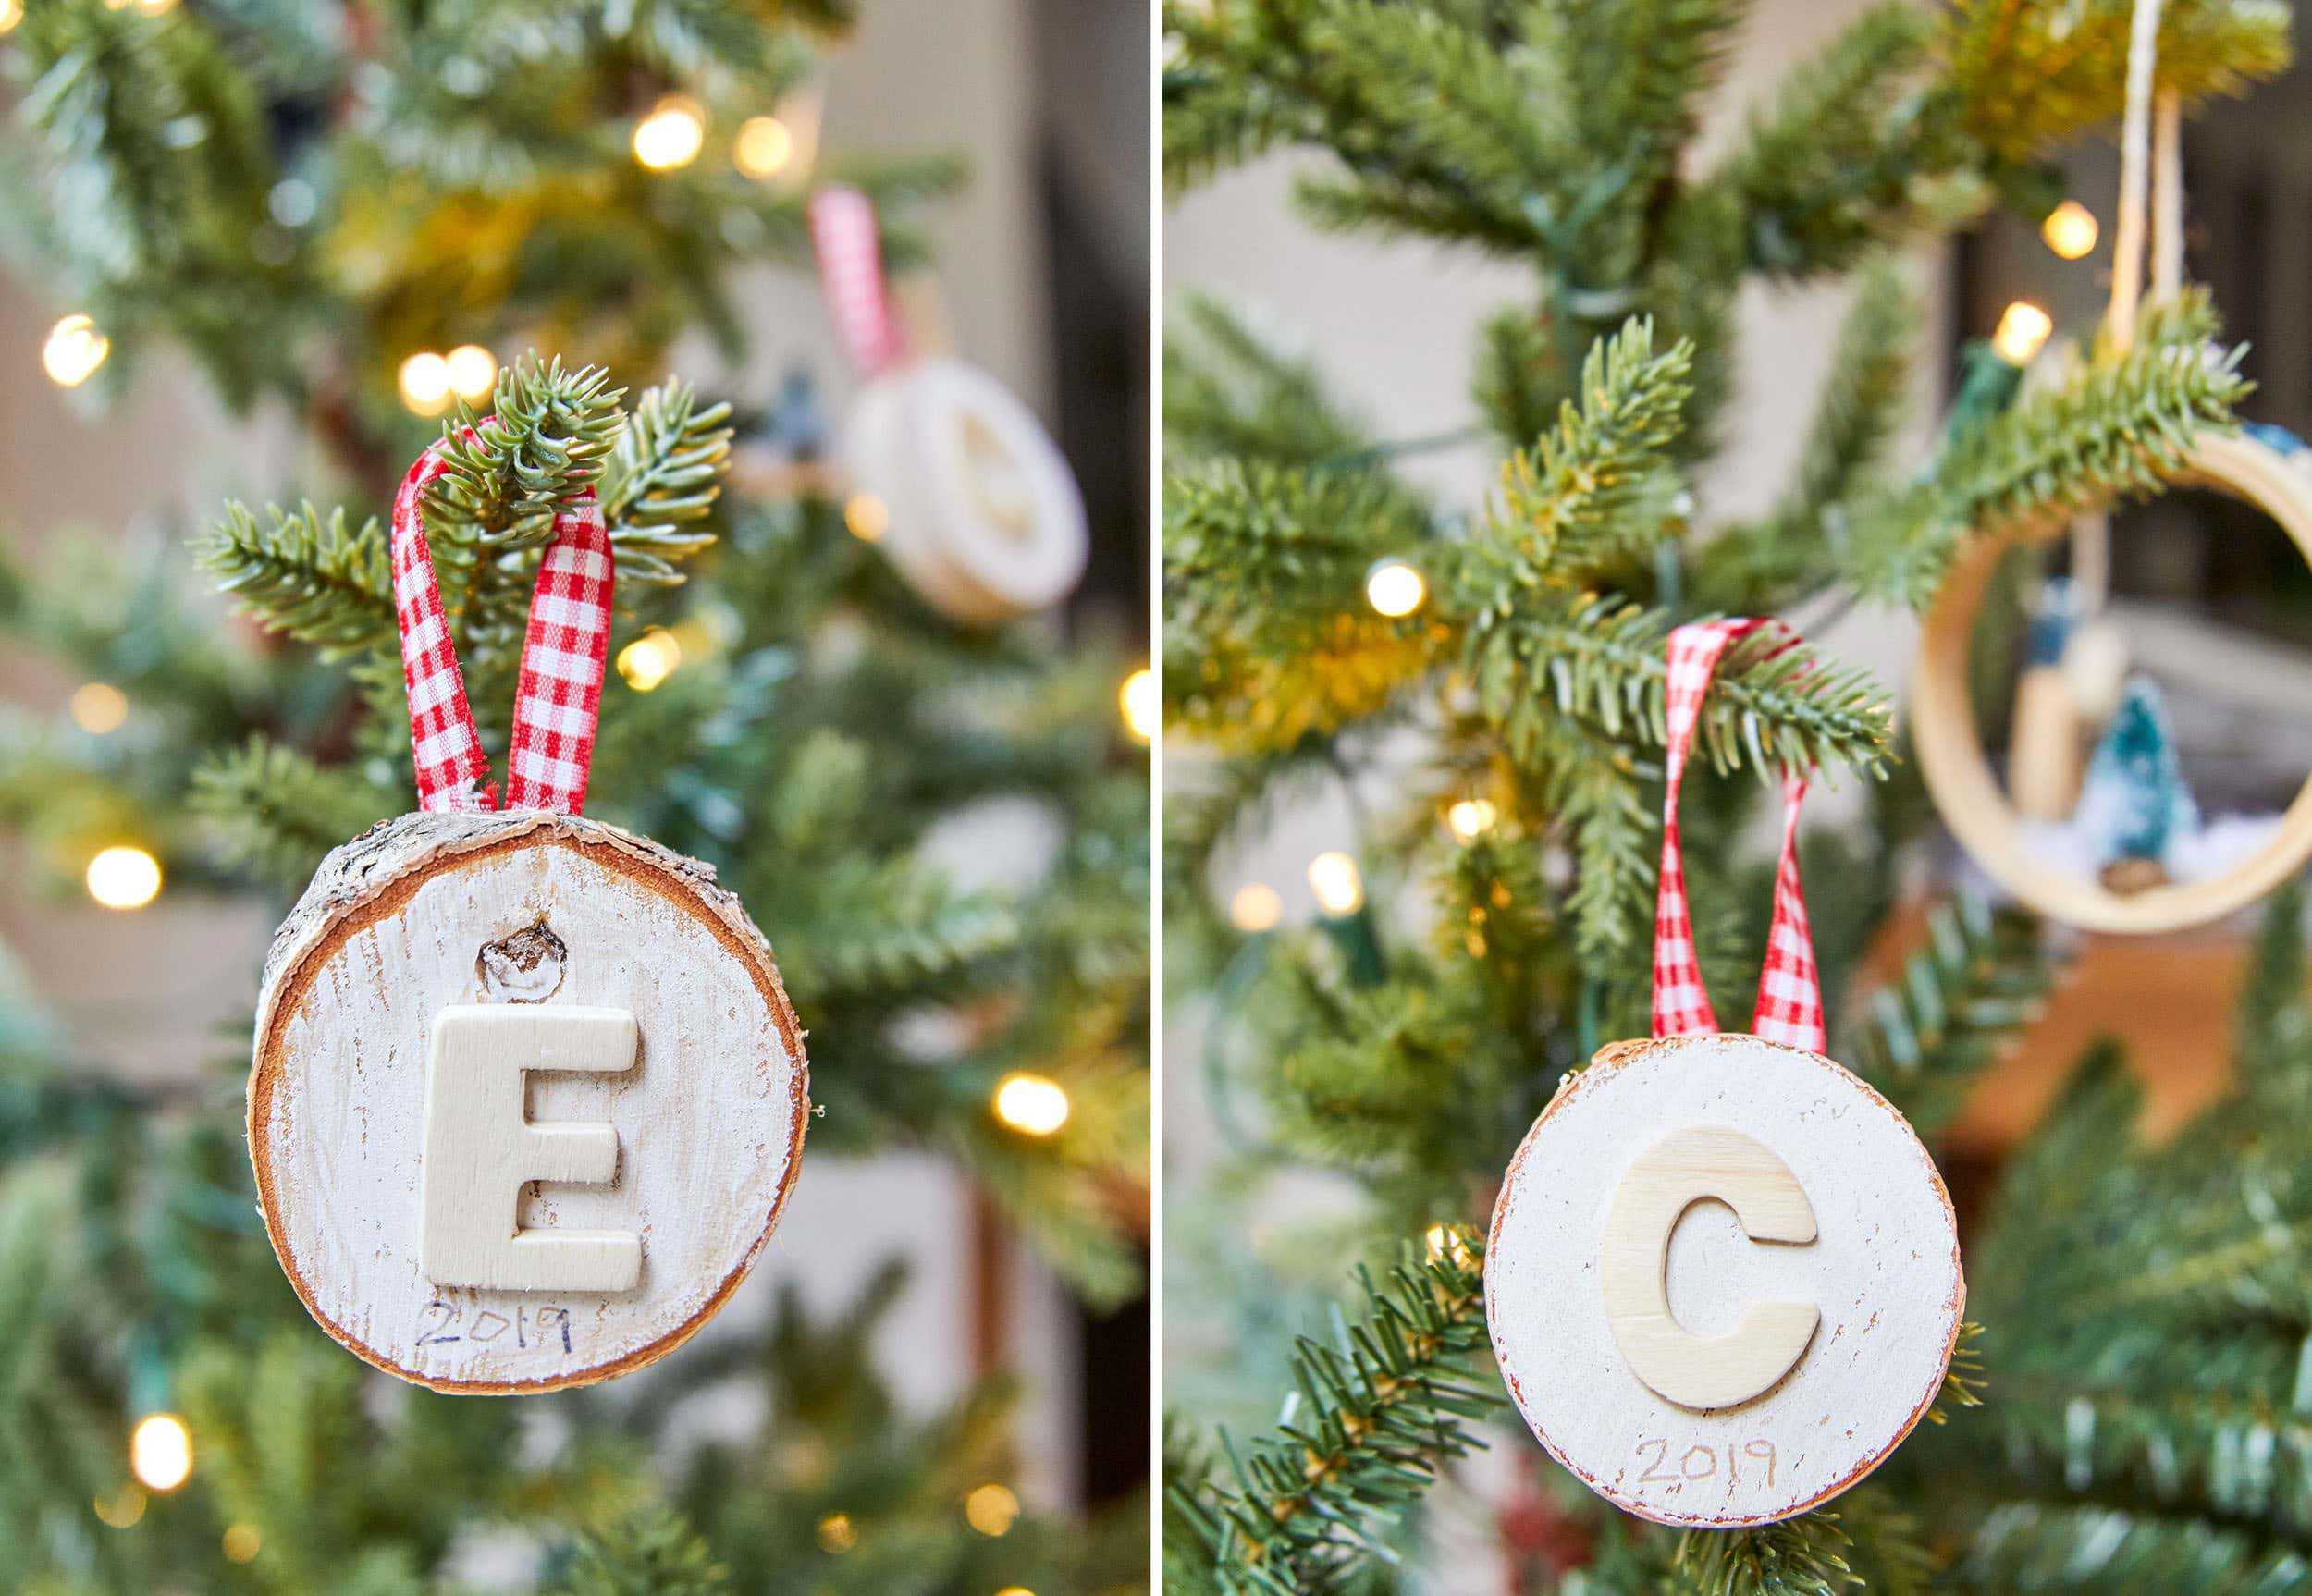 Emily Henderson Diy Ornaments Side By Side 1